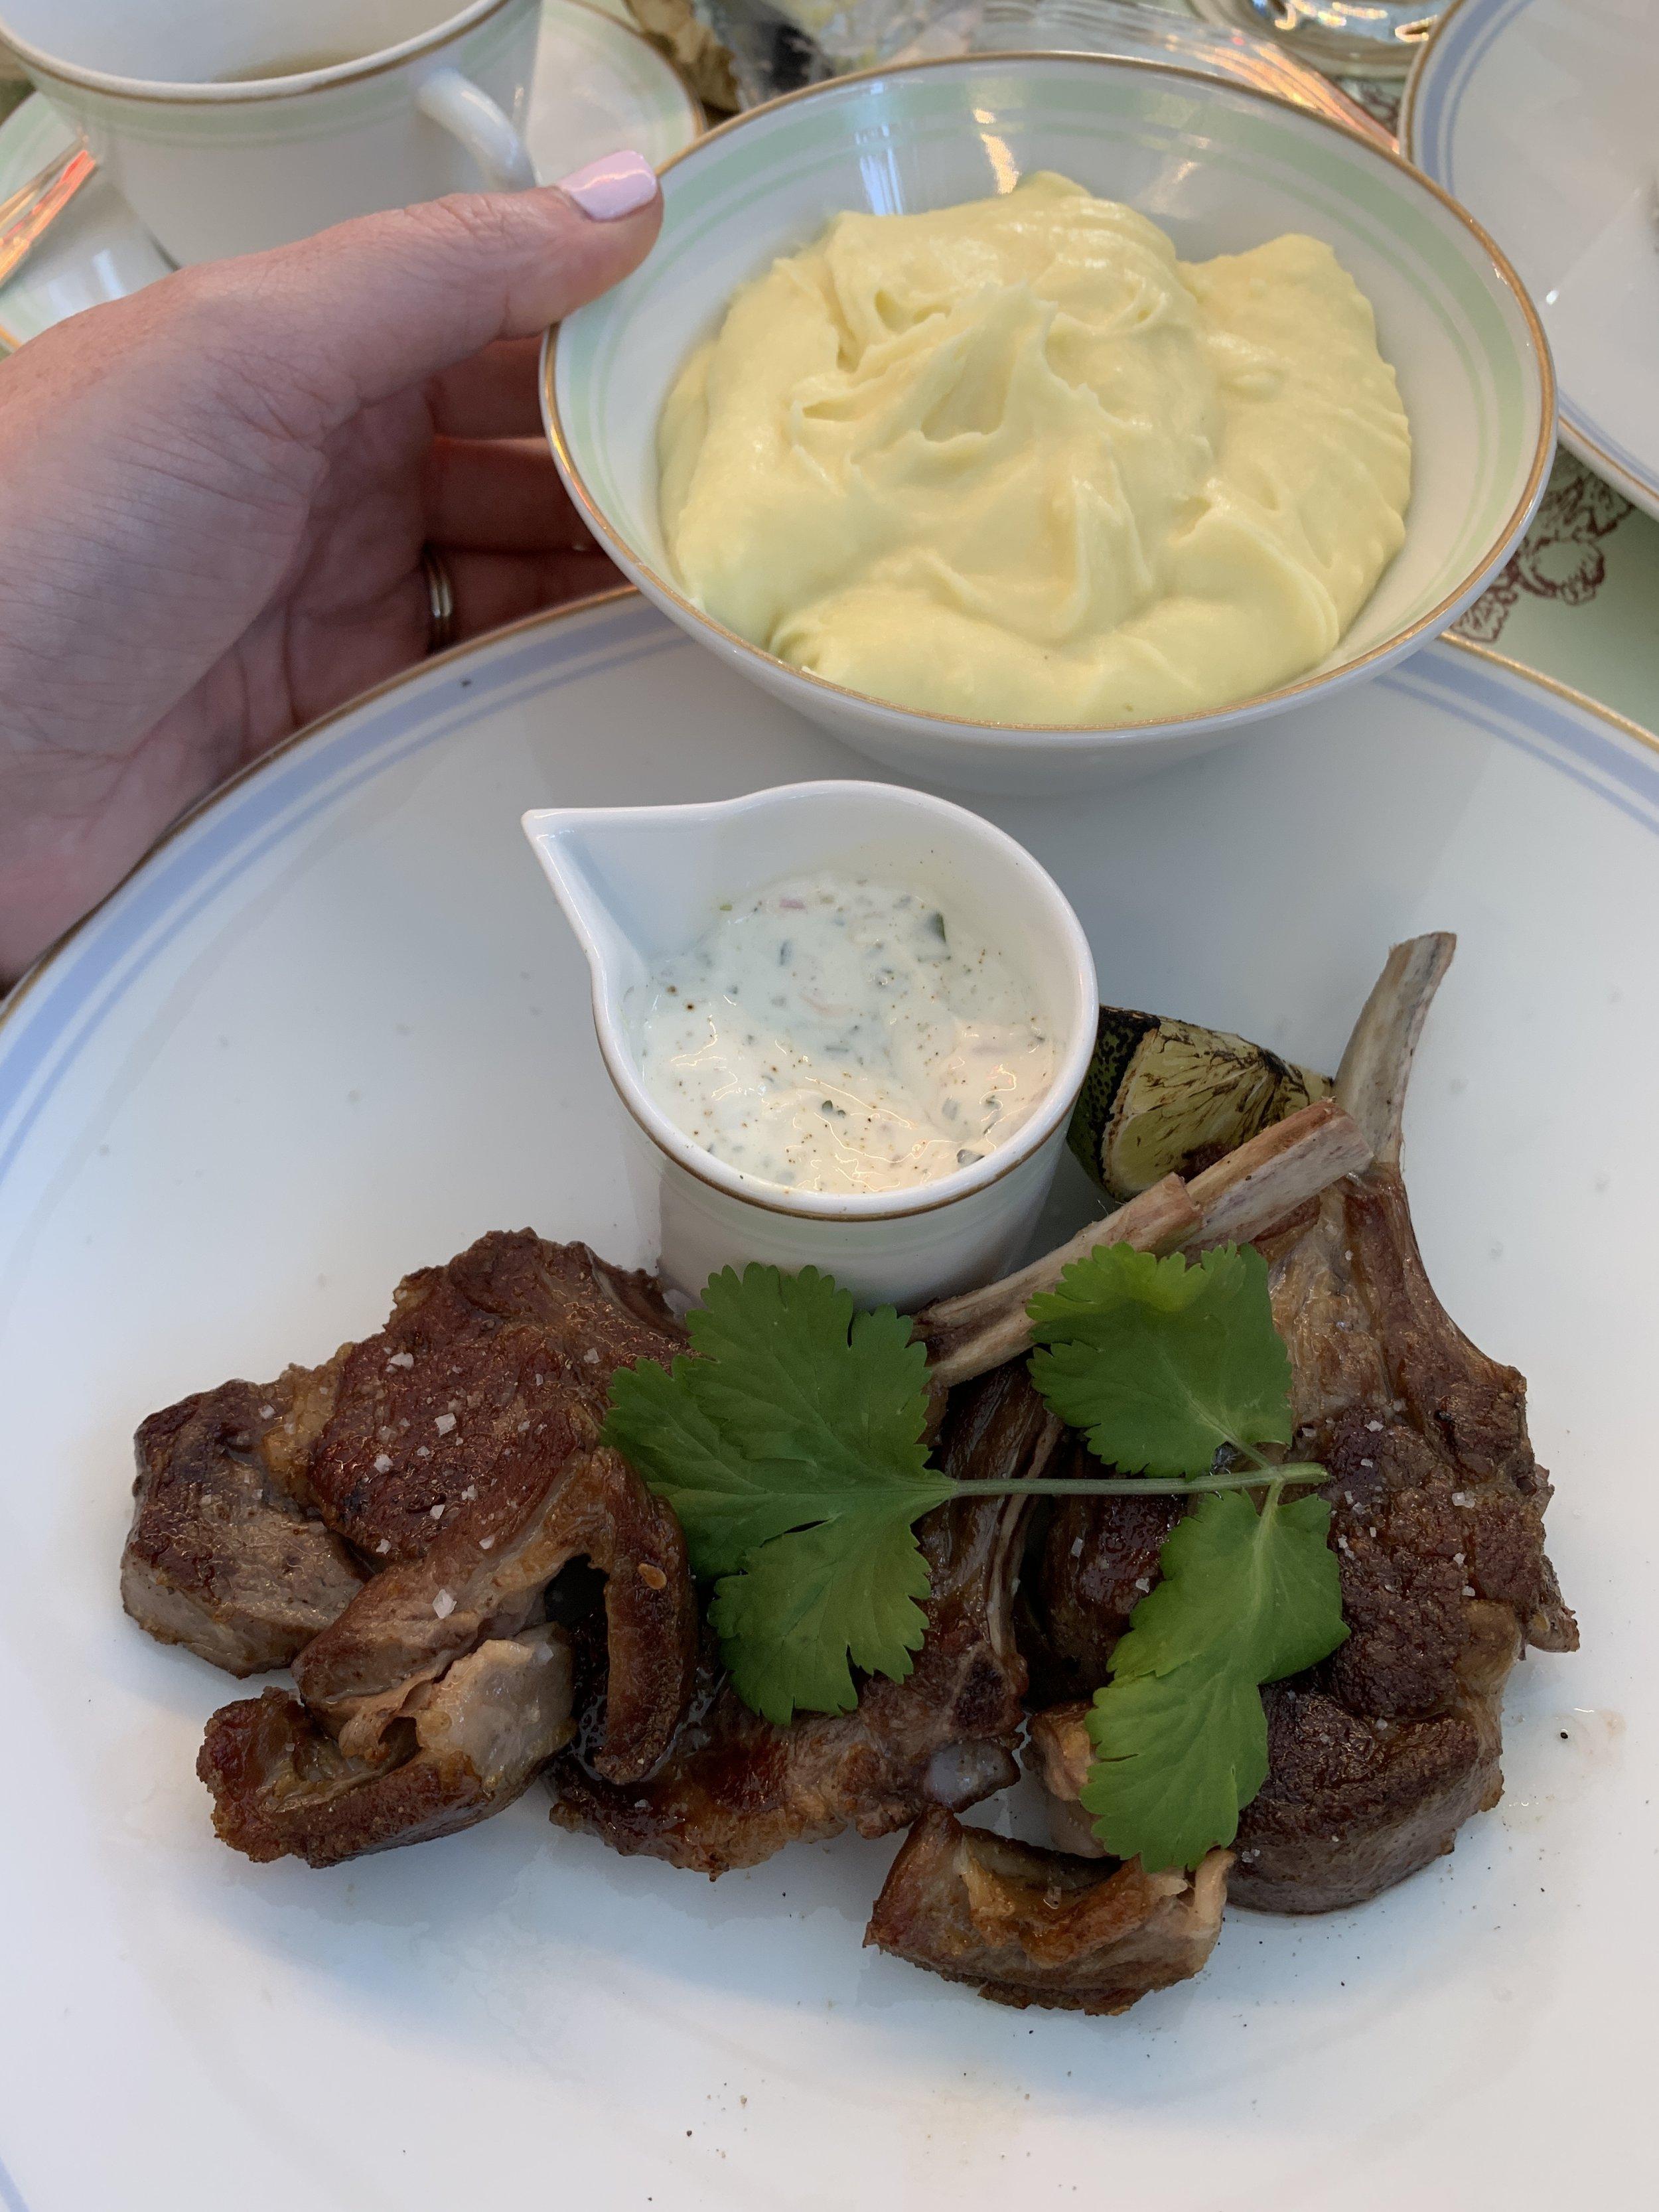 Lamb chops and potatoes.